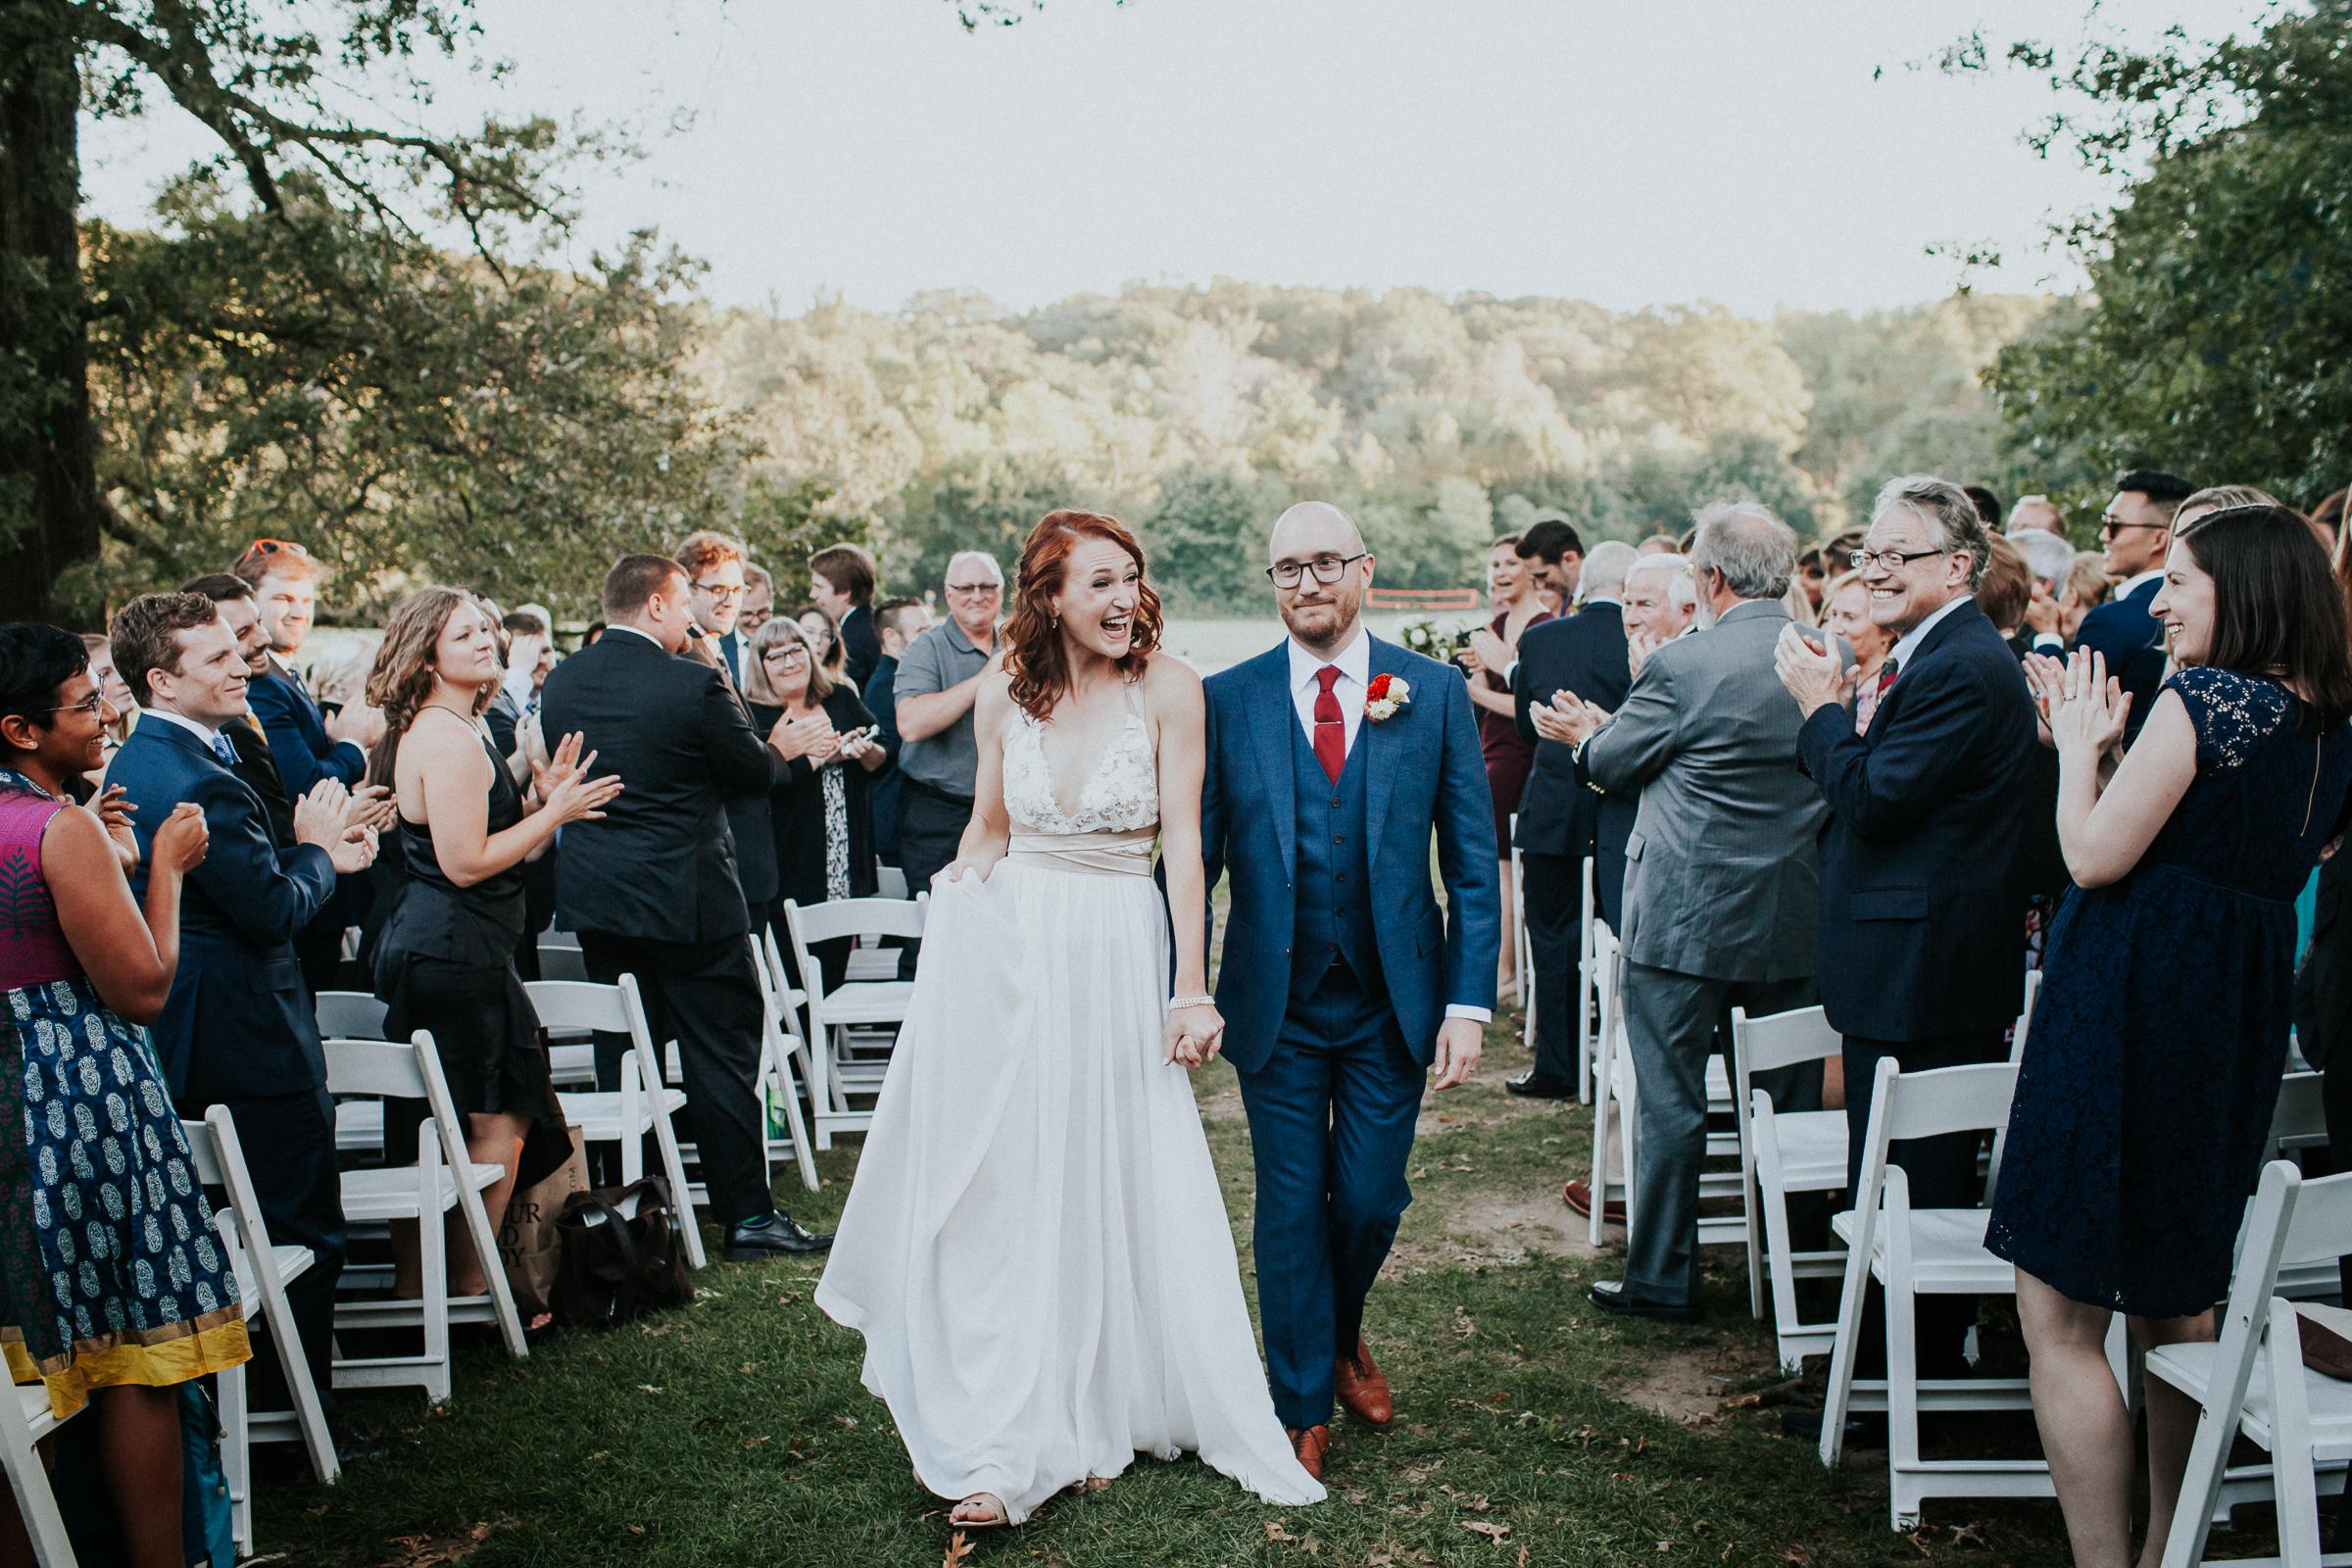 New-York-Documentary-Wedding-Photography-Best-Of-2017-by-Elvira-Kalviste-Photography-115.jpg